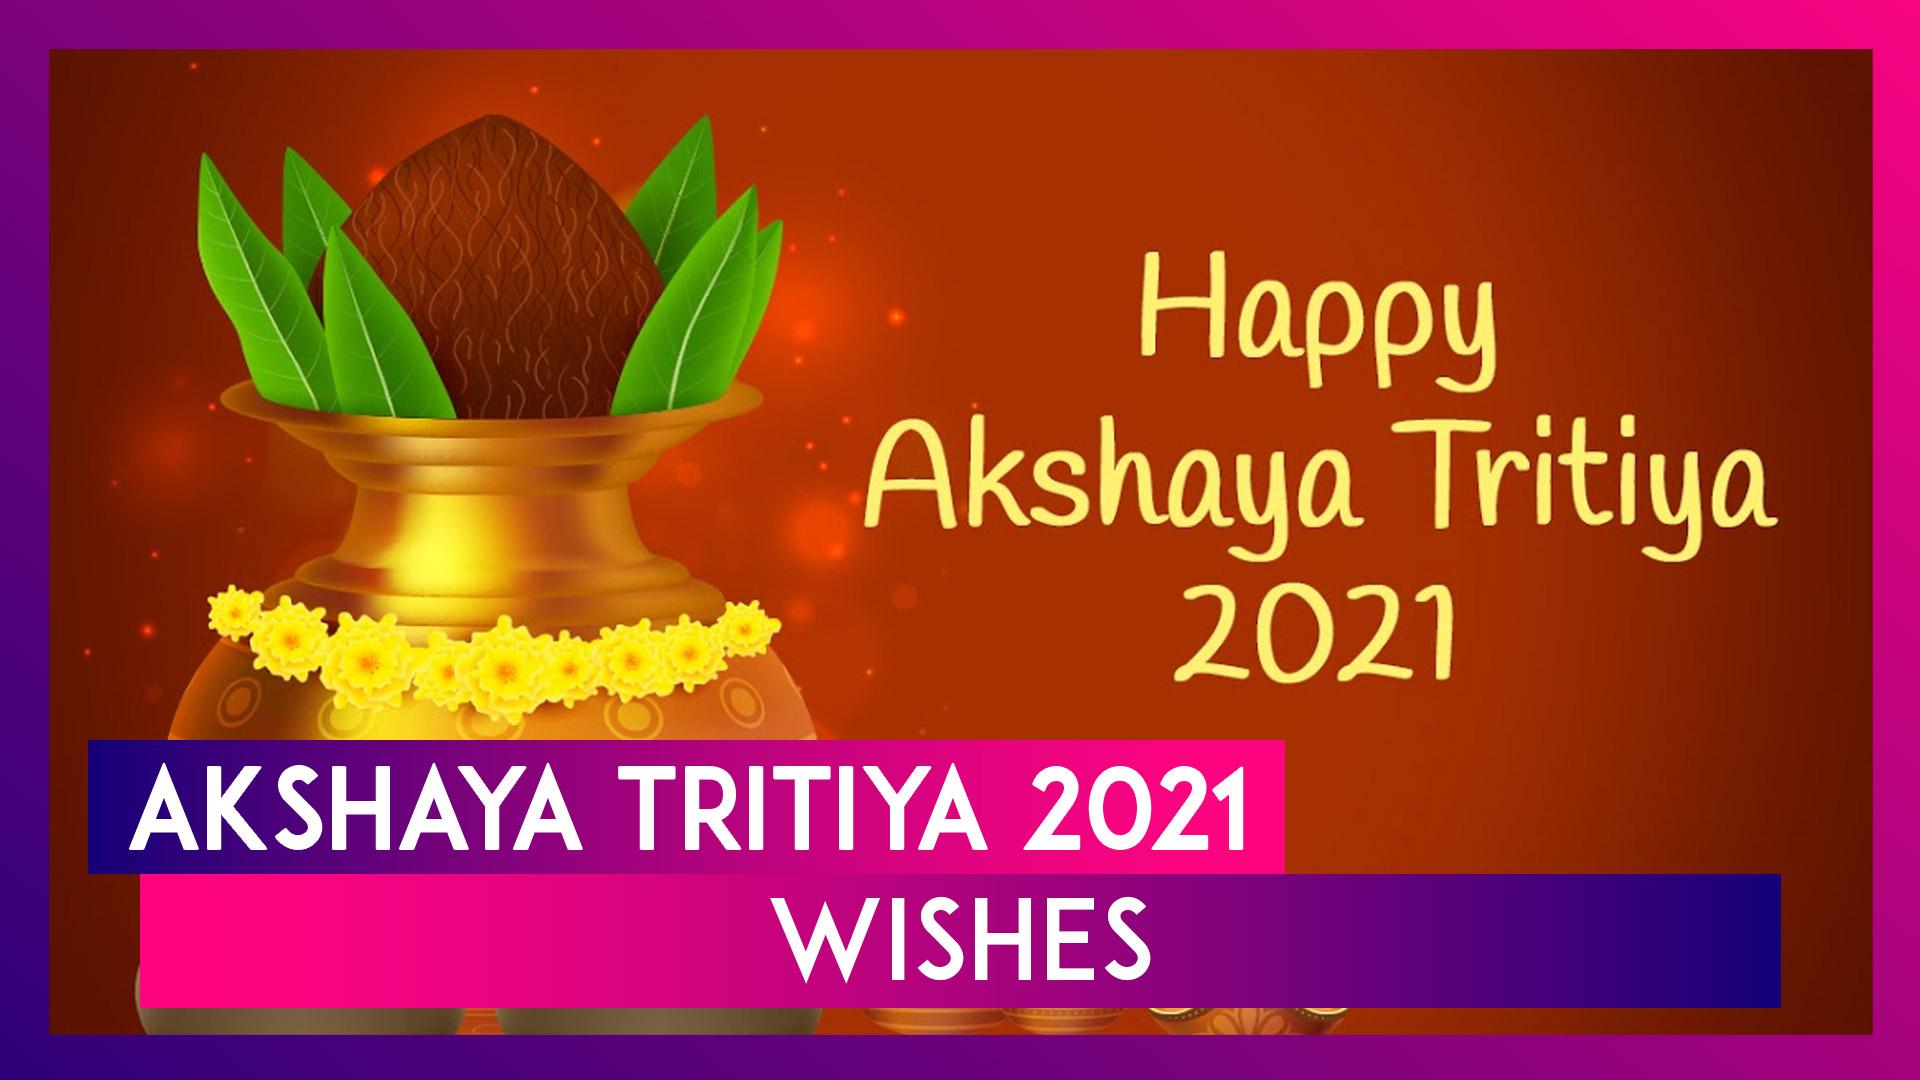 Akshaya Tritiya 2021 Wishes: Share Devotional Messages & Akha Teej Greetings to Worship Lord Vishnu